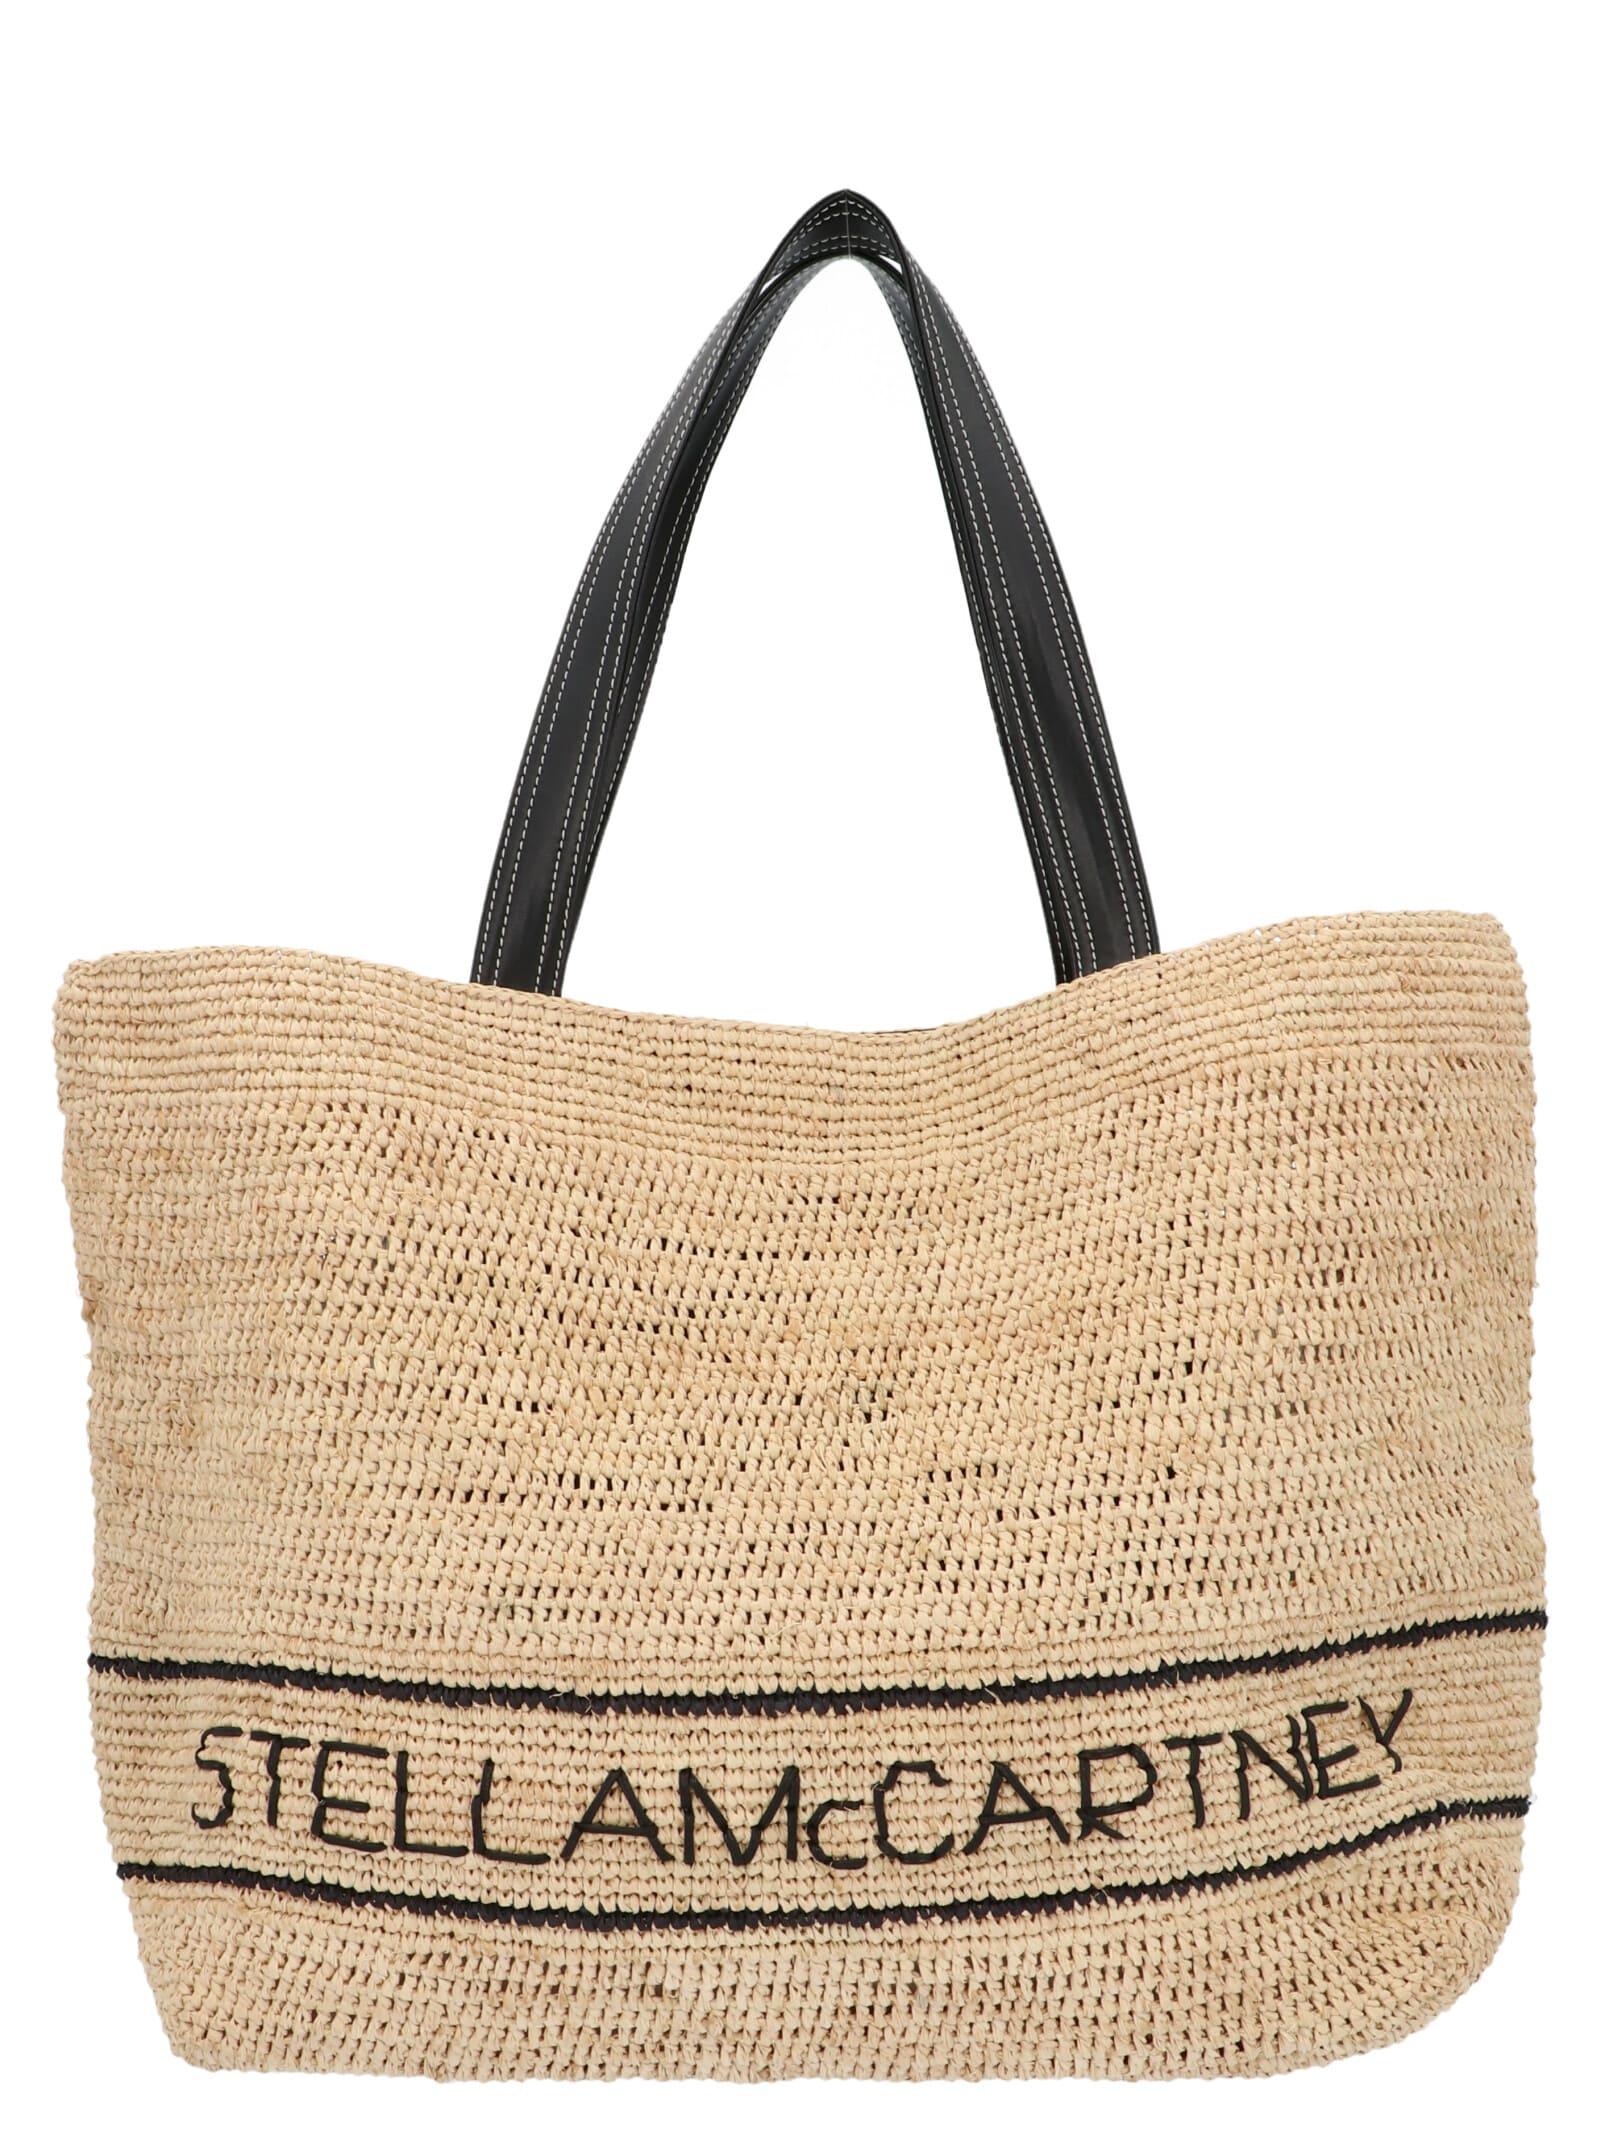 Stella Mccartney Bag In Beige